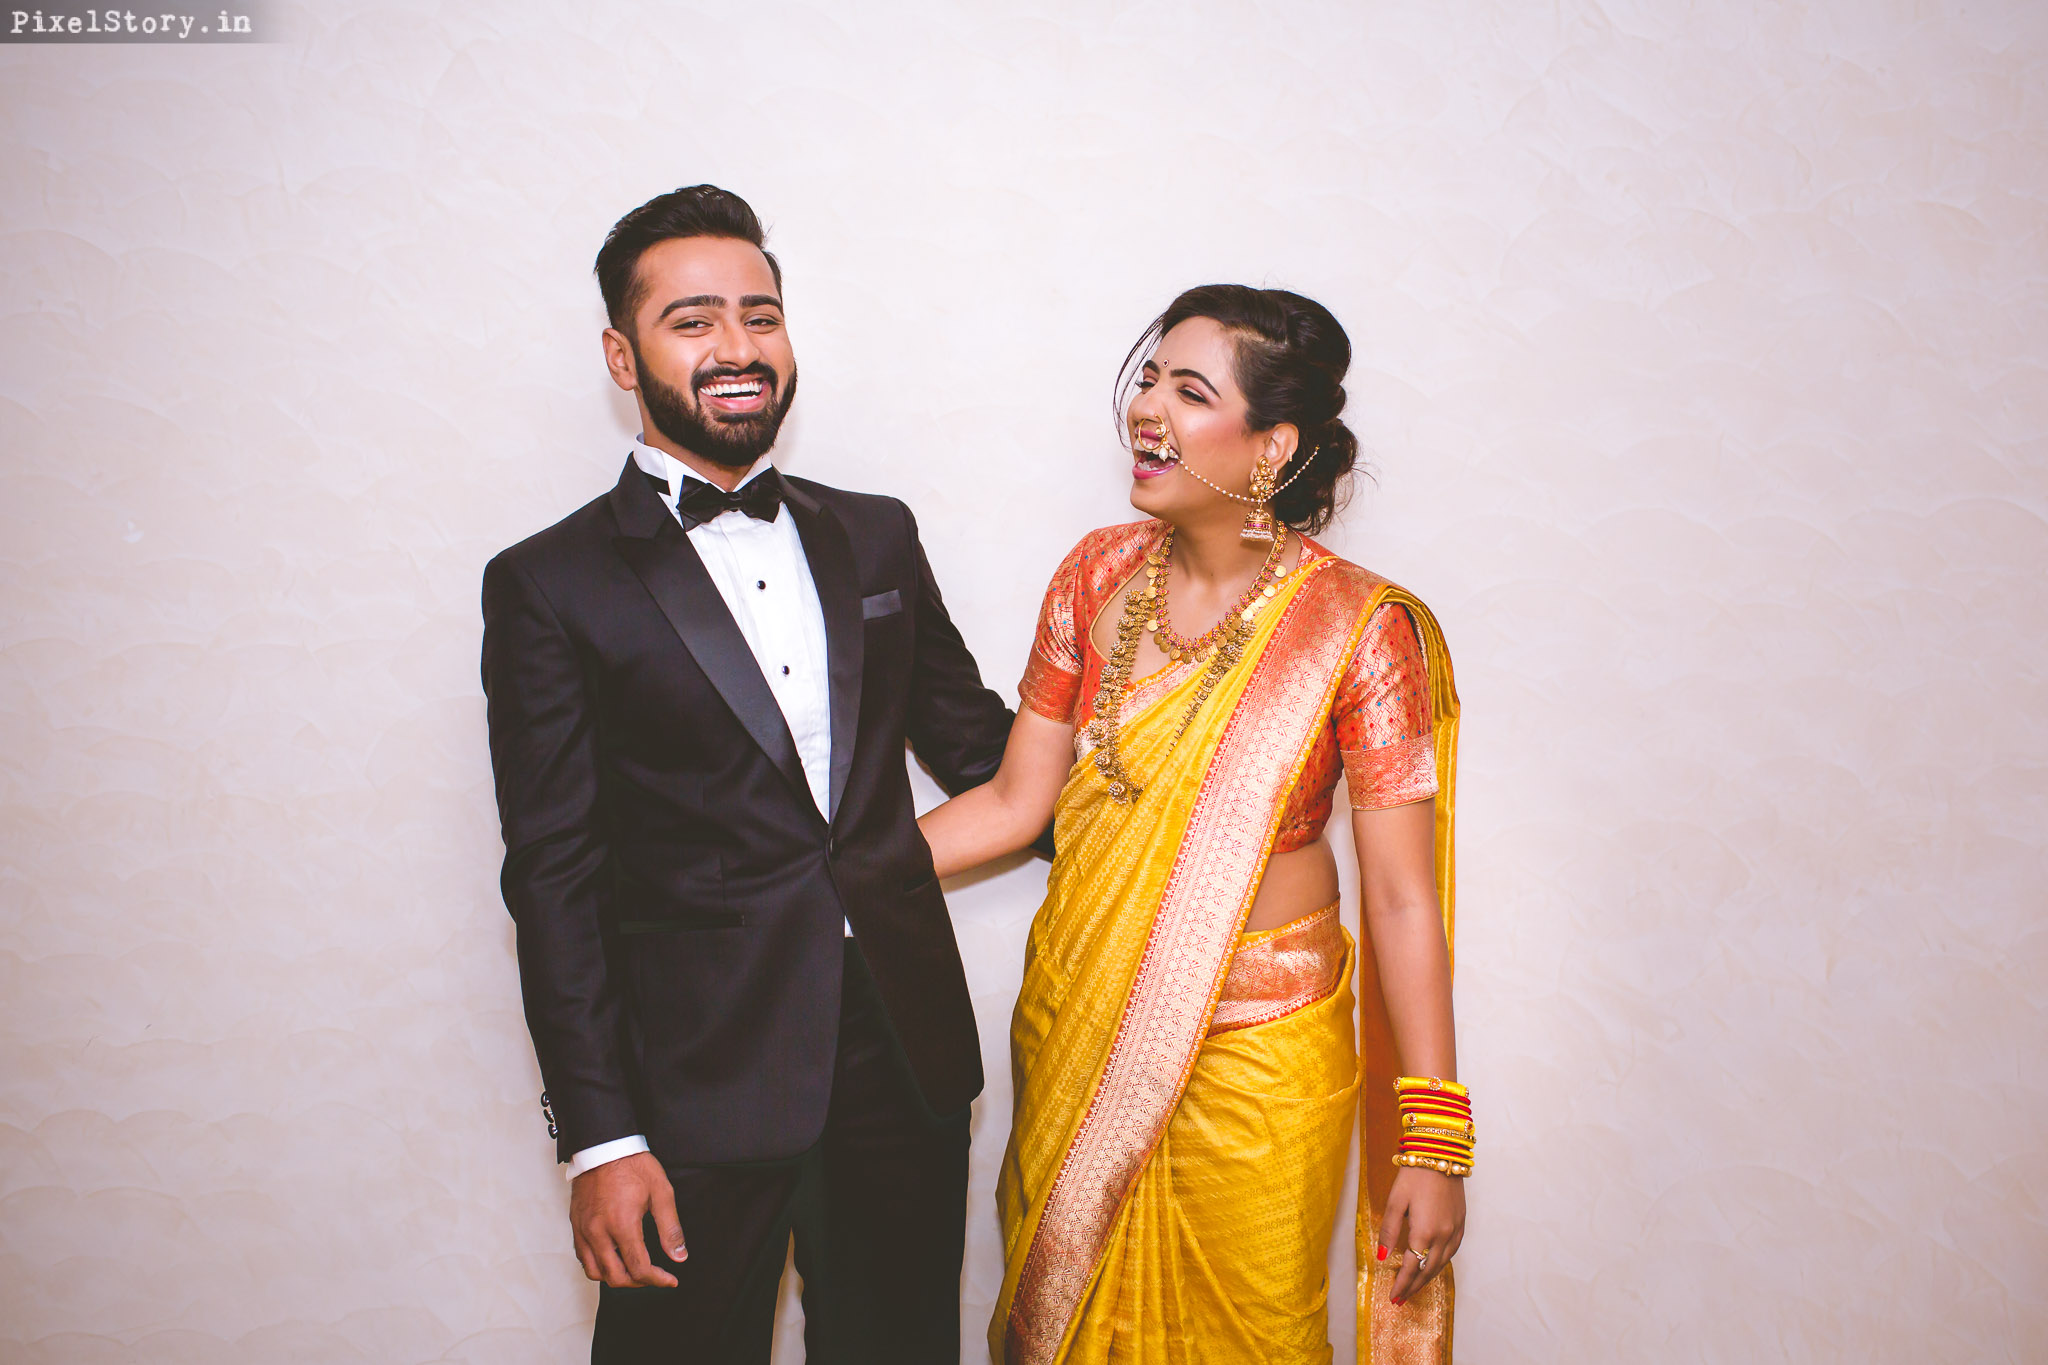 PixelStory-Engagement-Ritz-Carlton-Preksha-Bharath-003.jpg